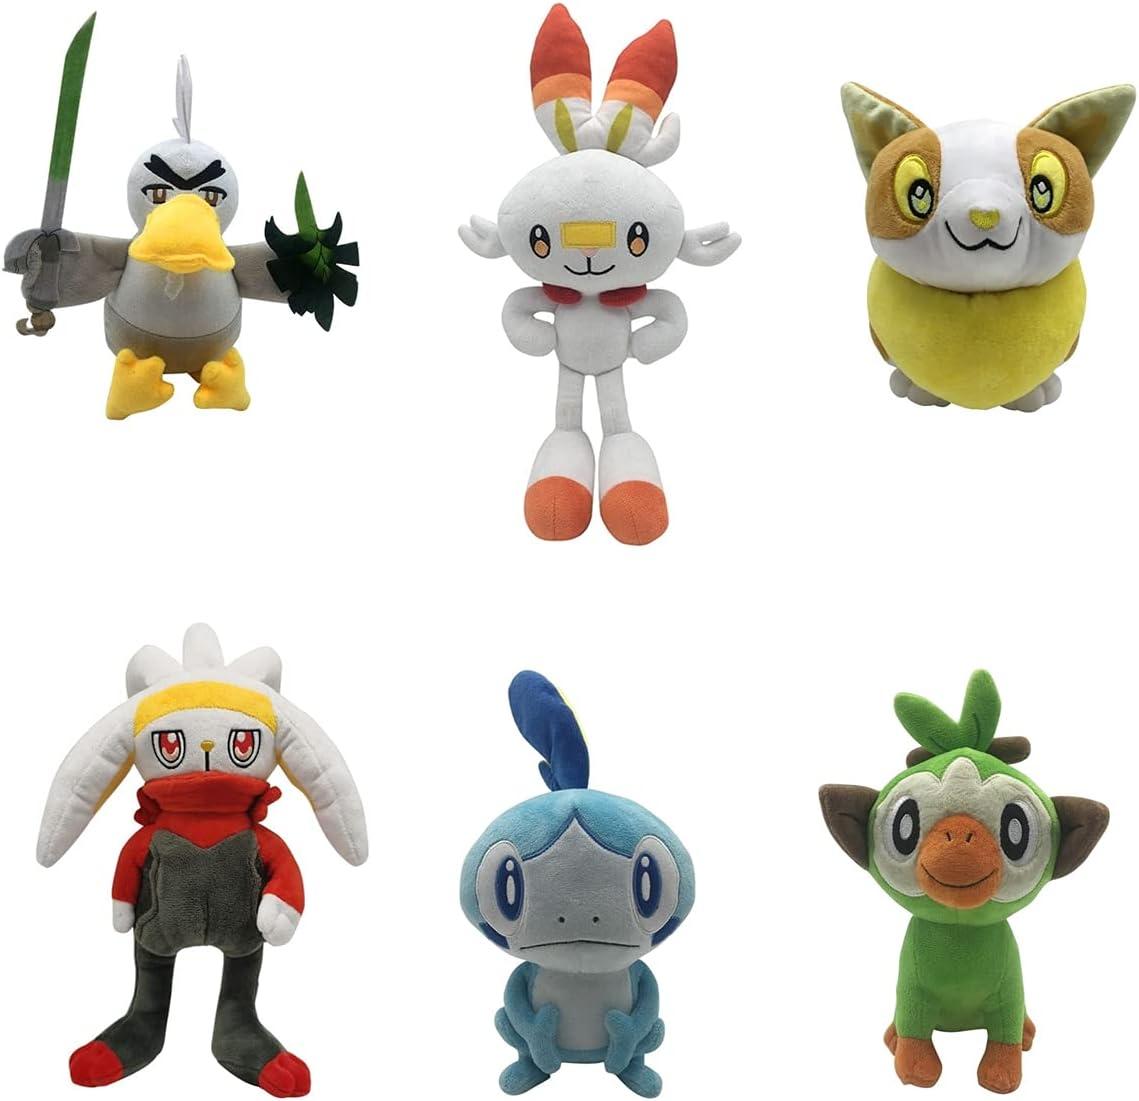 Now free shipping 6Pcs Pokemon Plush Sobble Scorbunny Elf Figure P Max 64% OFF Grookey Cartoon